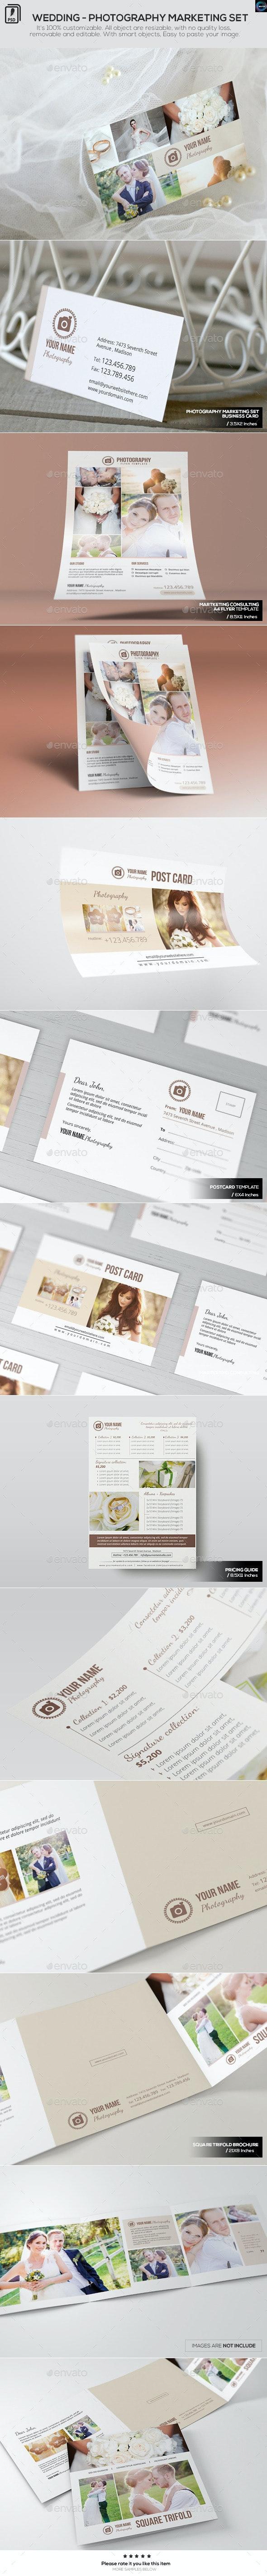 Wedding-Photography Marketing Set - Miscellaneous Print Templates